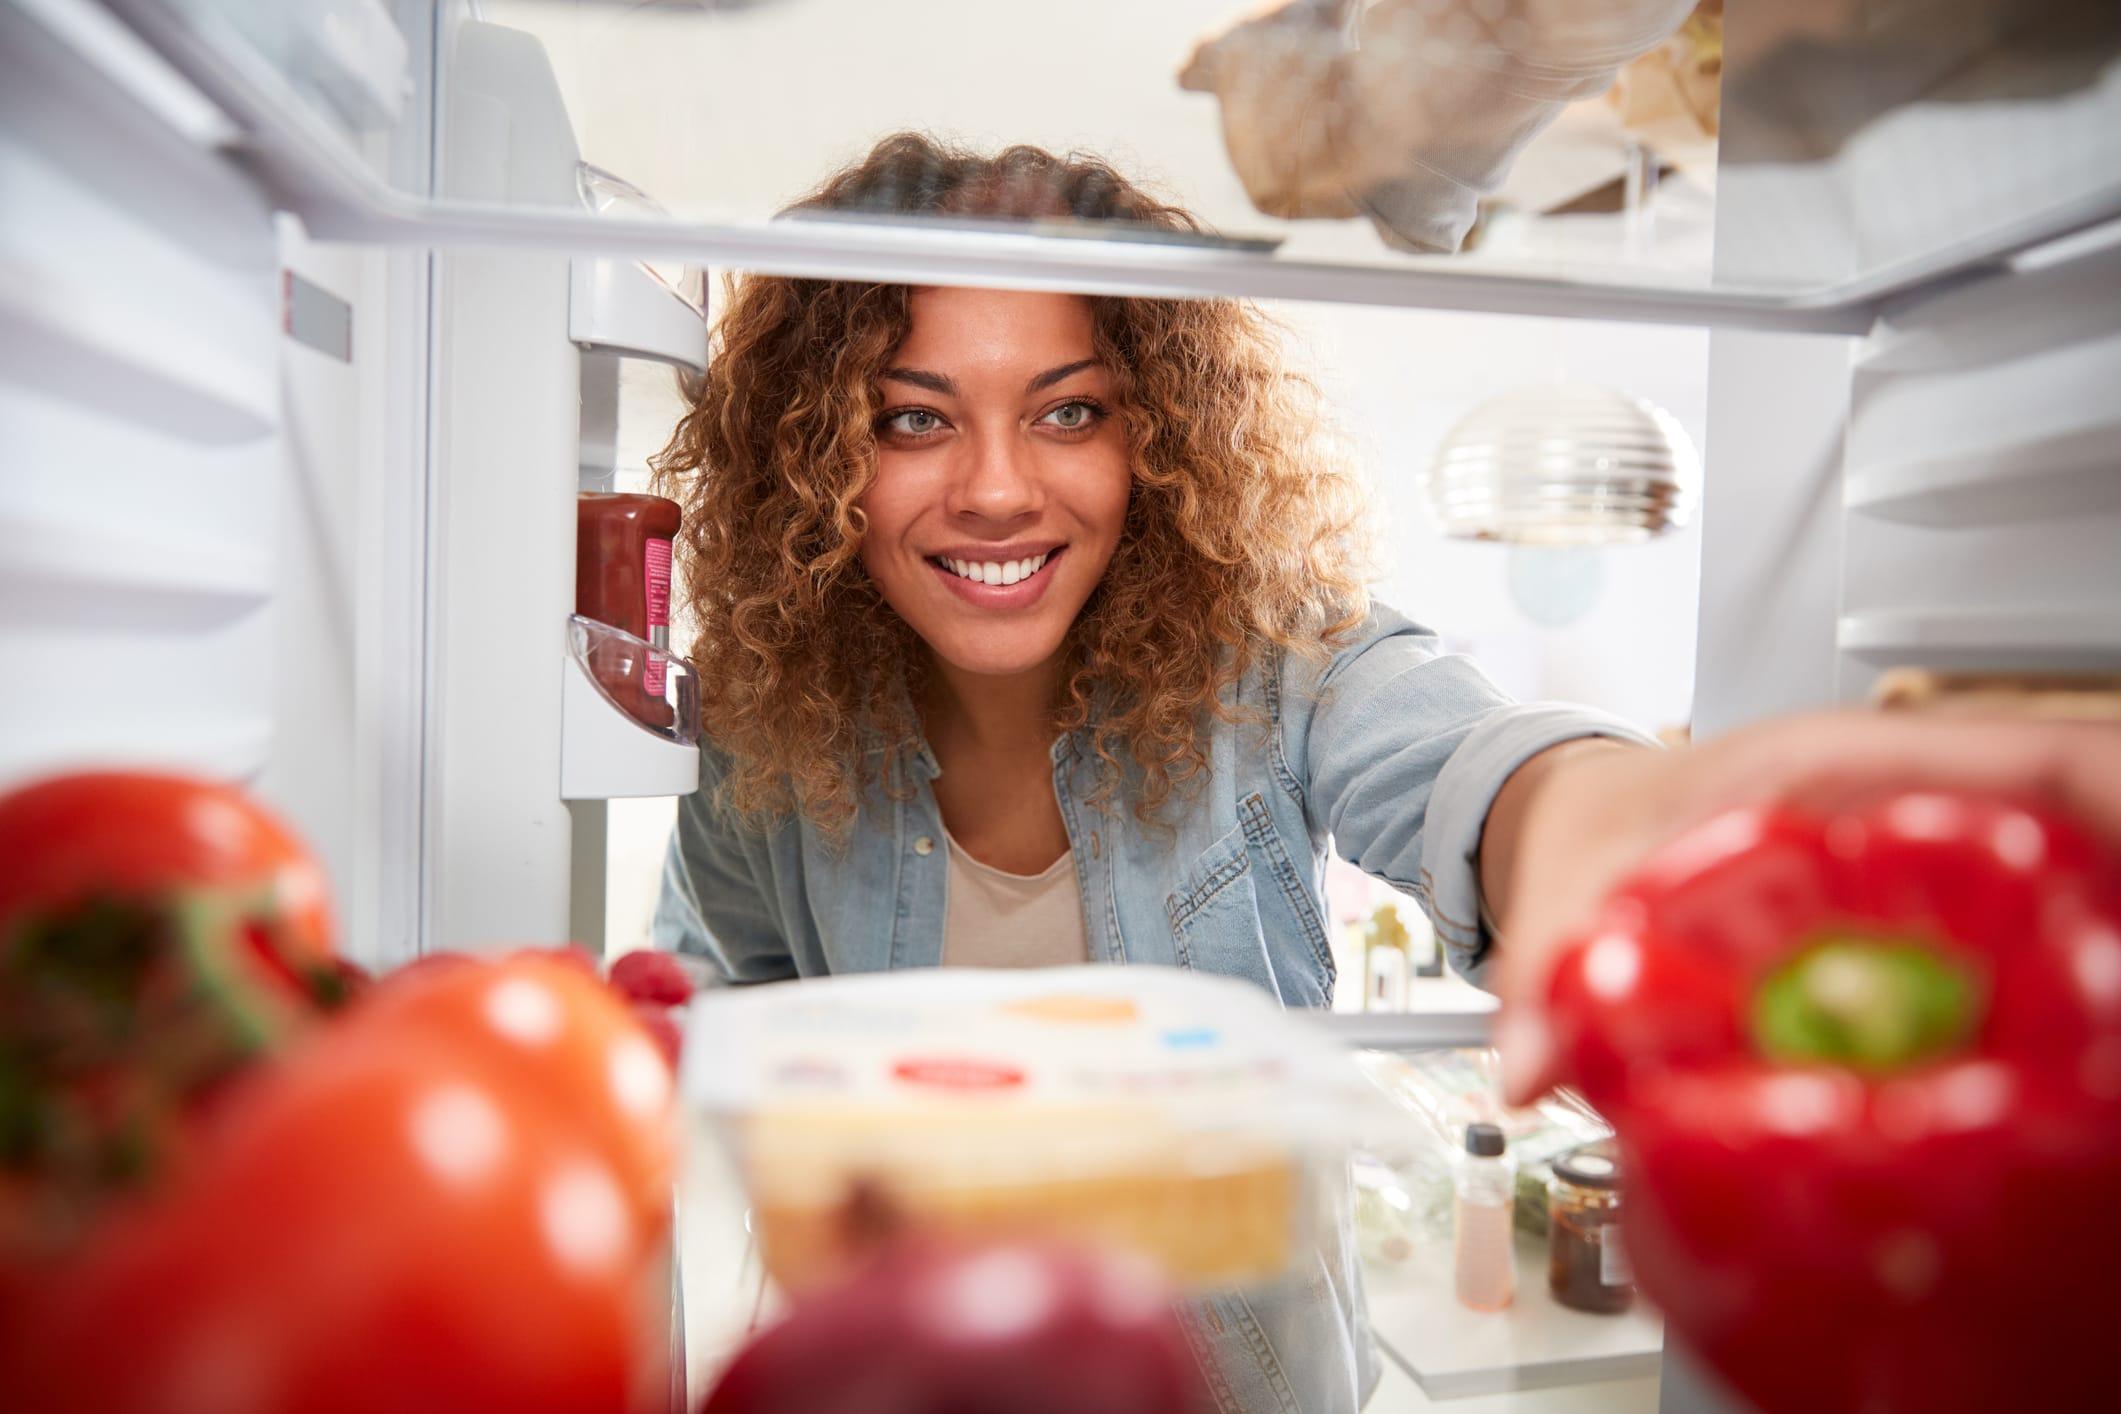 woman puts food into fridge